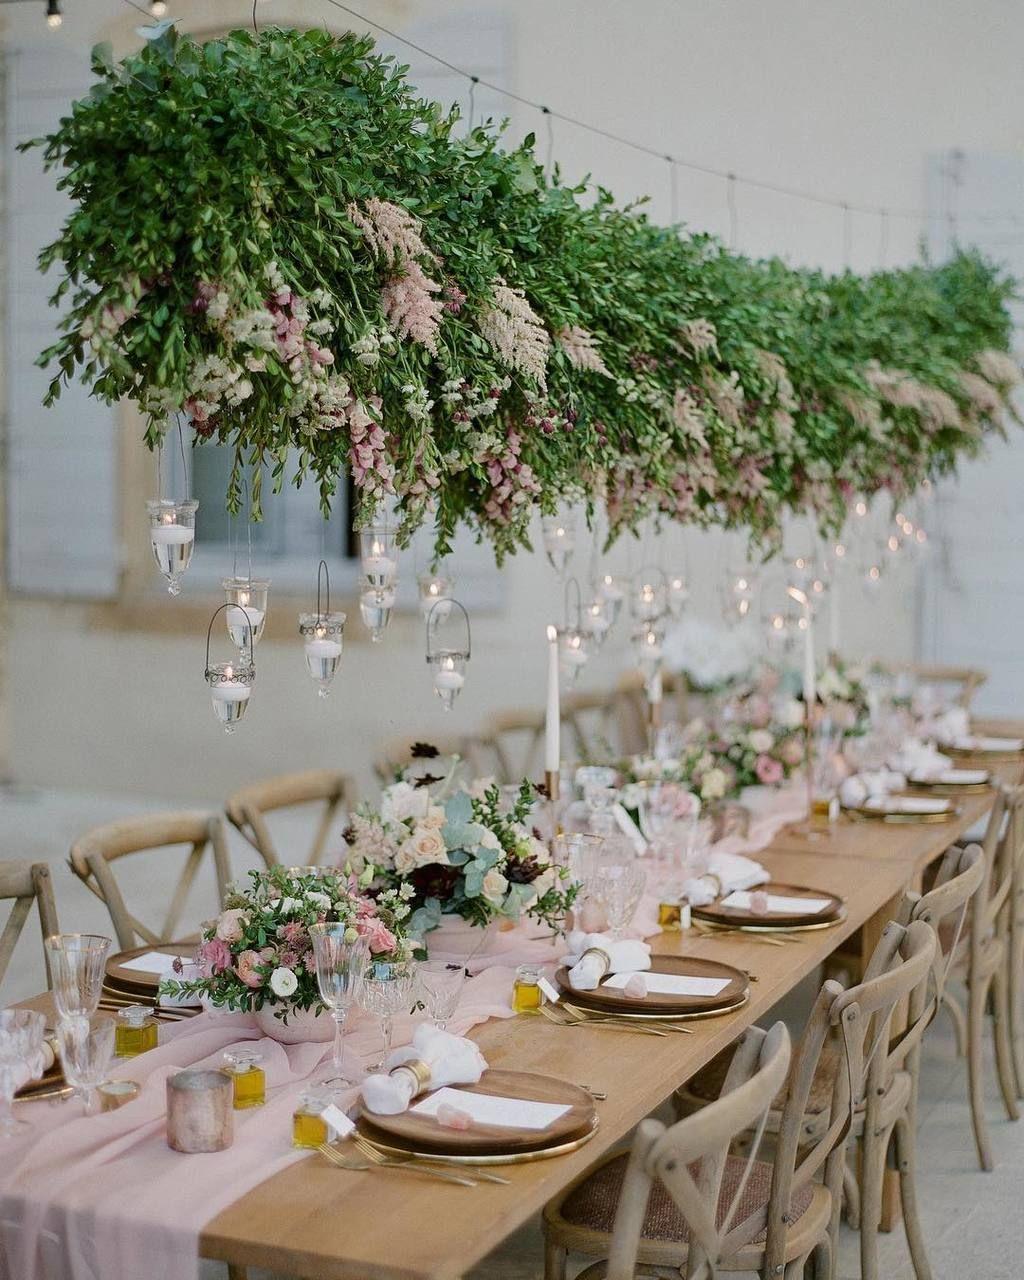 25 Unique Wedding Ideas To Get Inspire: 25 Unique Wedding Lights To Brighten Your Day